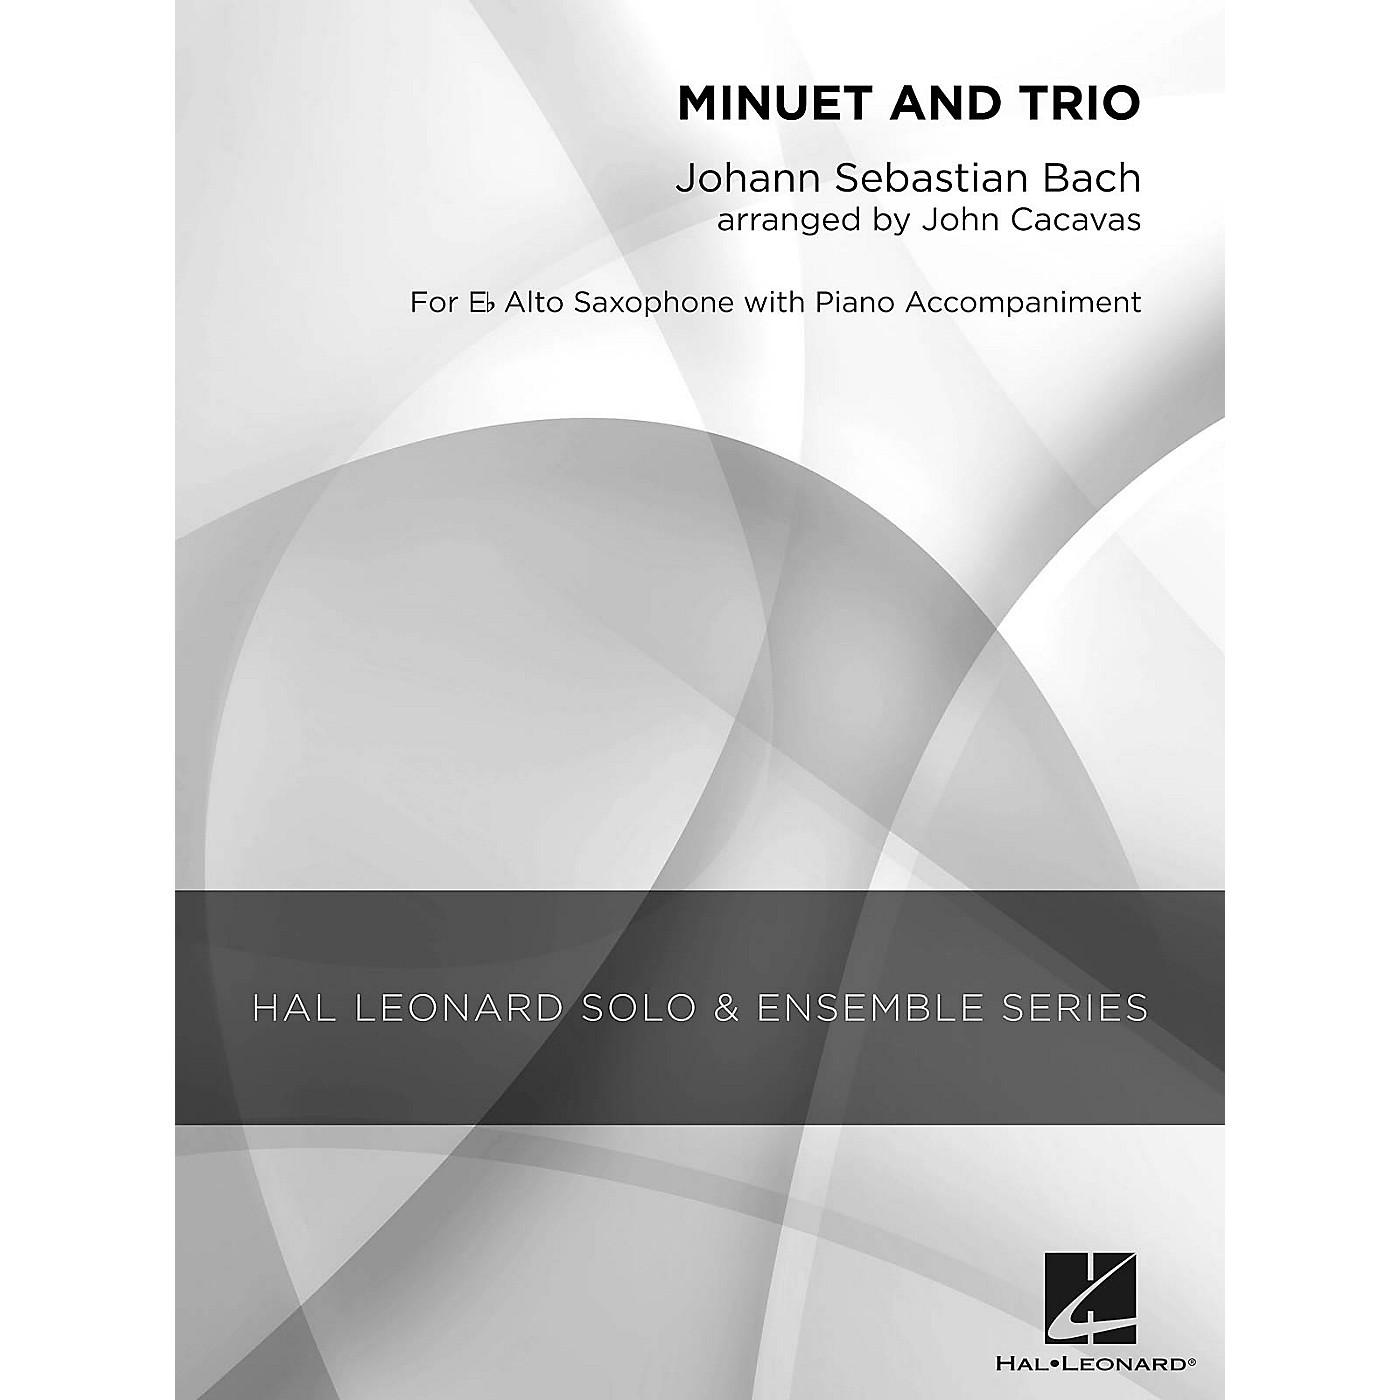 Hal Leonard Minuet and Trio (Grade 2.5 Alto Saxophone Solo) Concert Band Level 2.5 Arranged by John Cacavas thumbnail